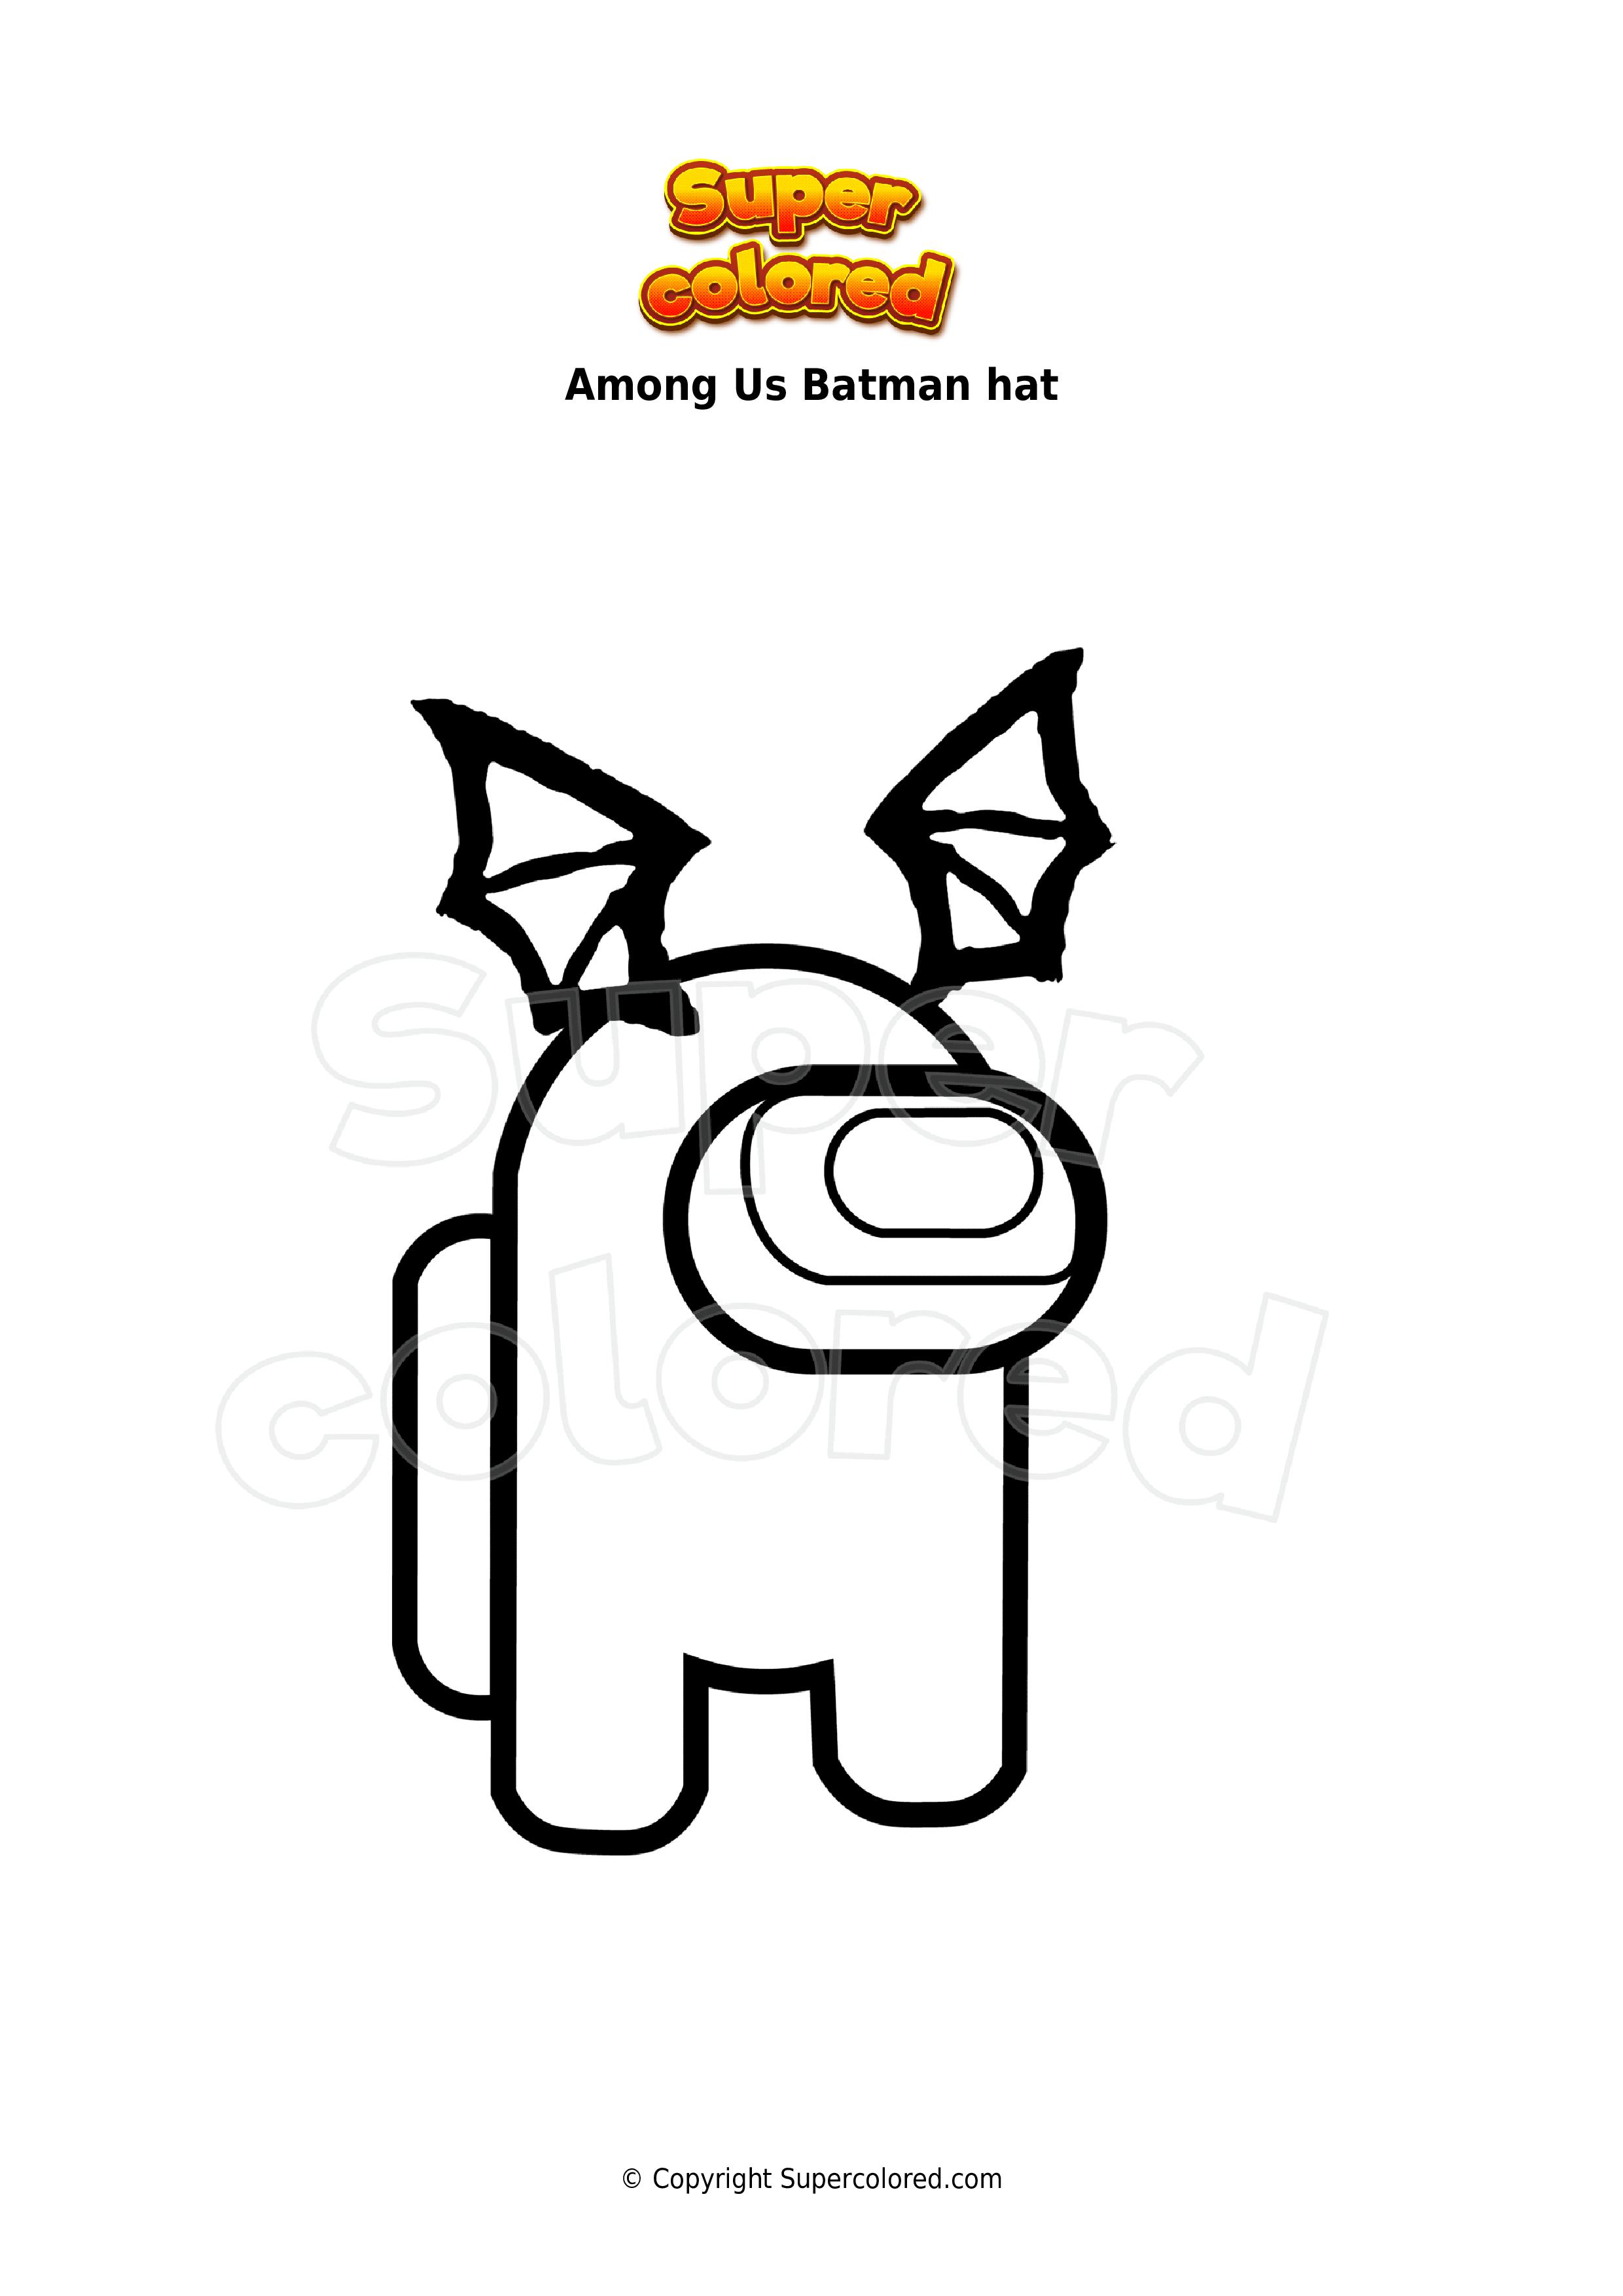 Ausmalbild Among Us Batman hat - Supercolored.com